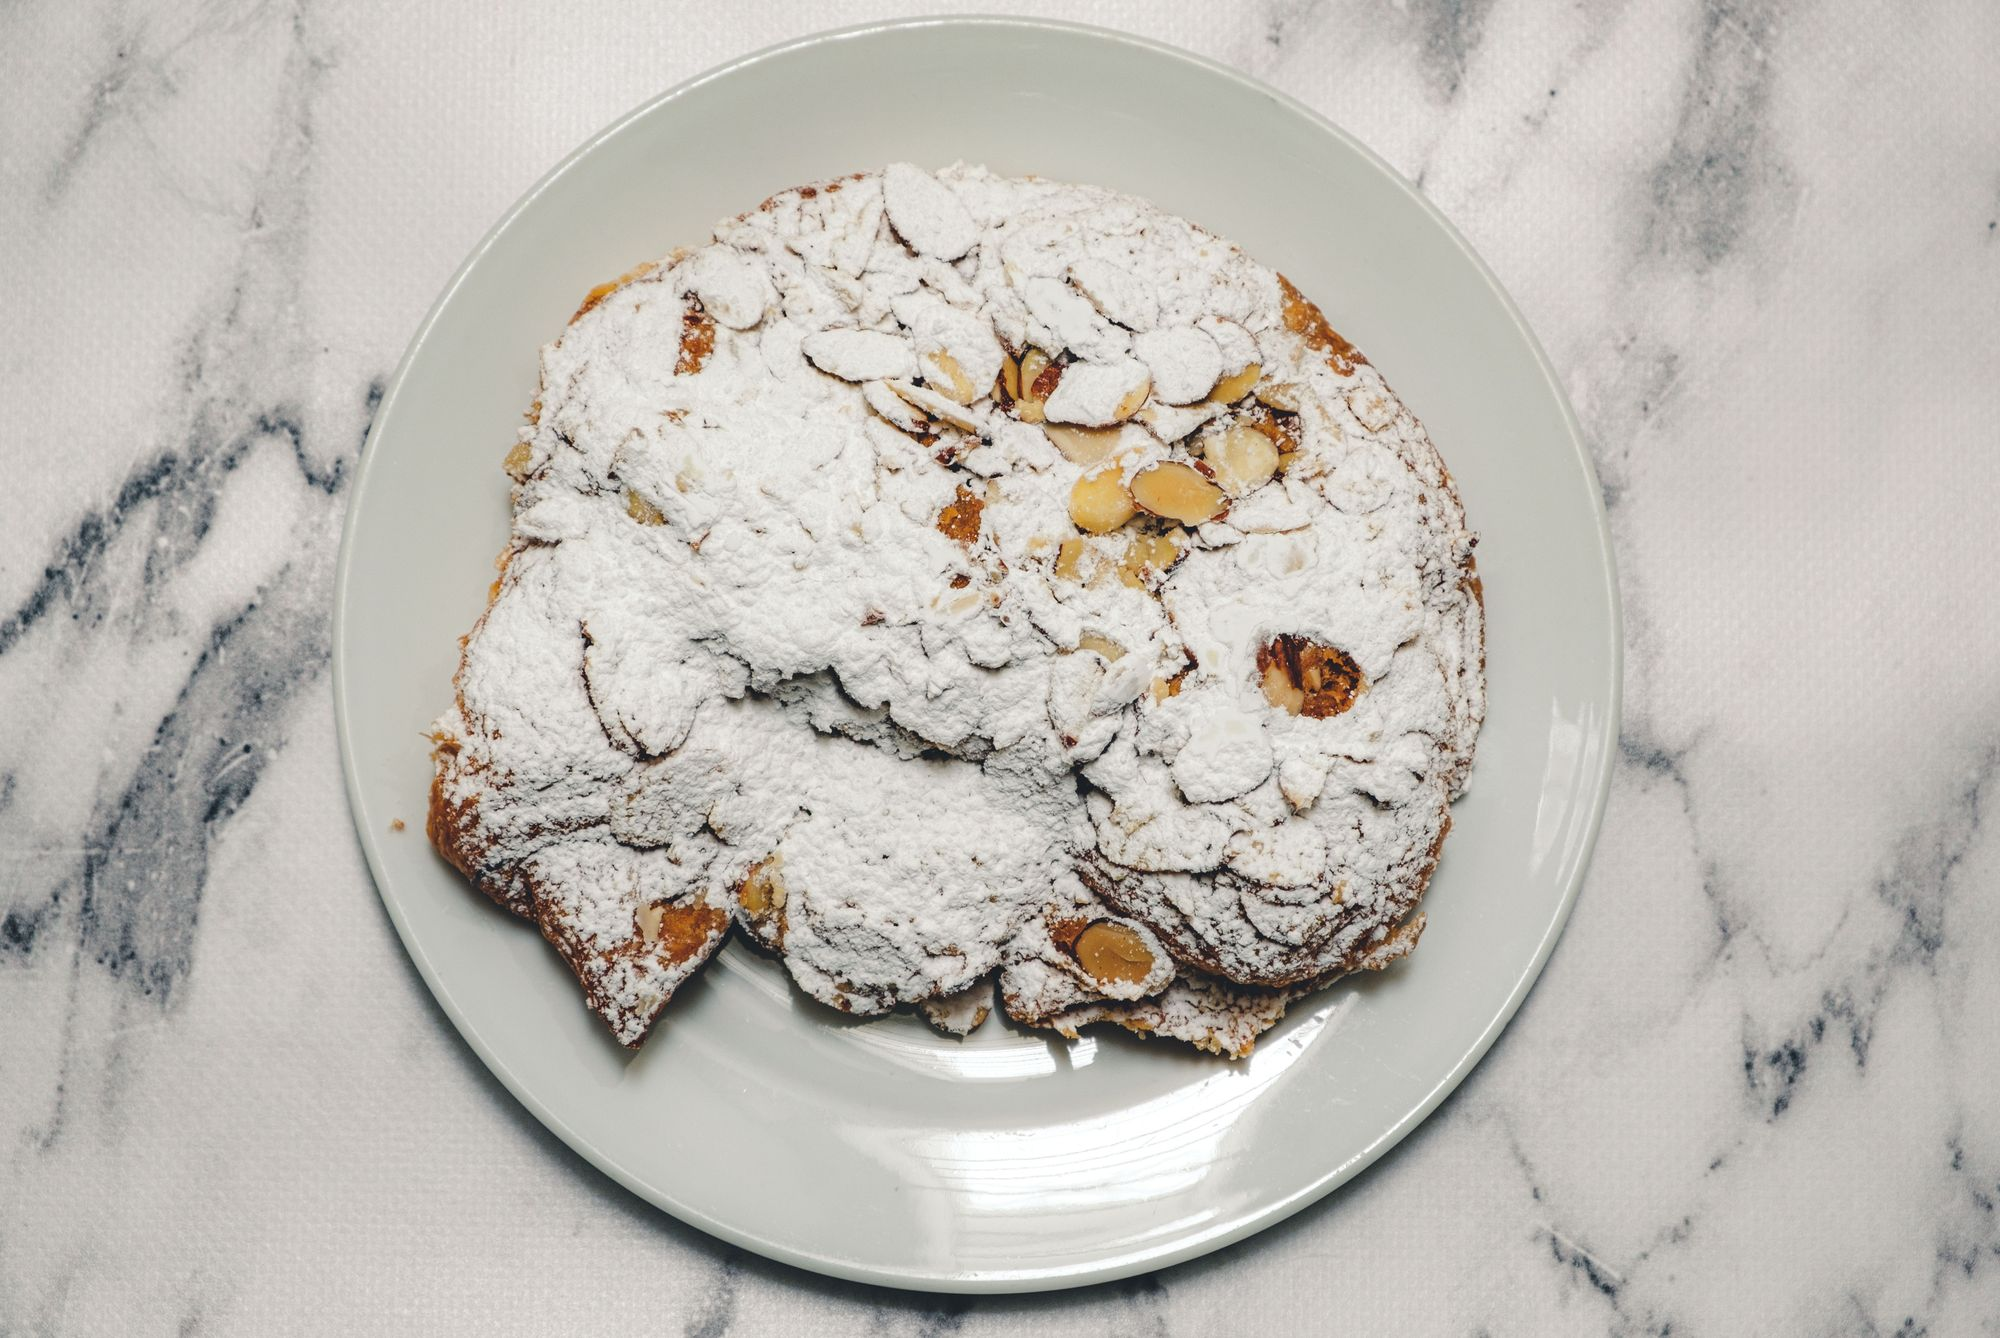 Purebread Almond Croissant ($4.75) - Overhead